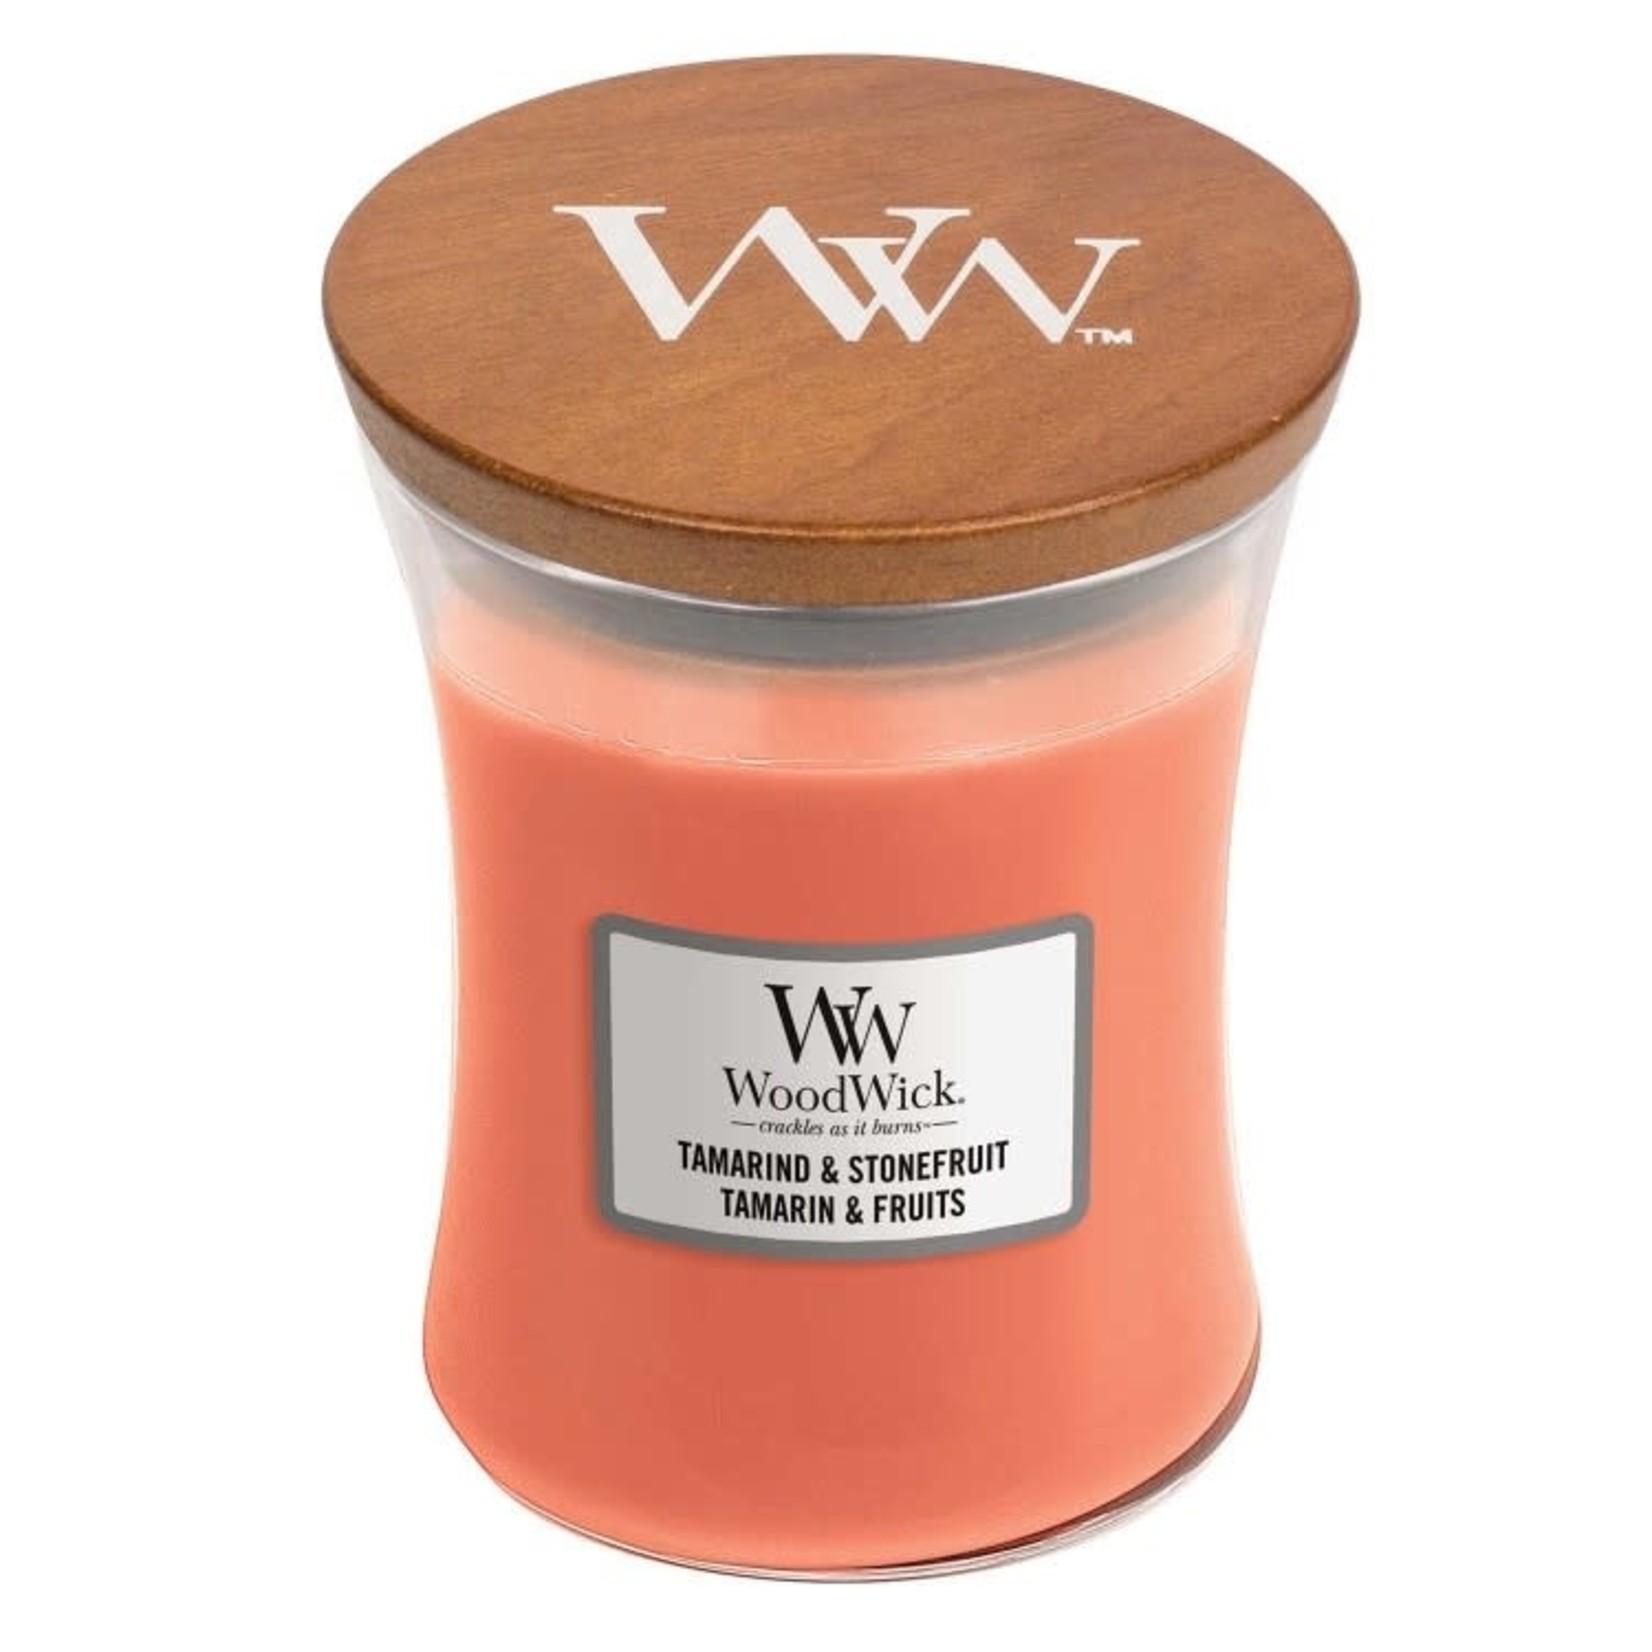 Woodwick WOODWICK TAMARIND AND STONEFRUIT MEDIUM CANDLE